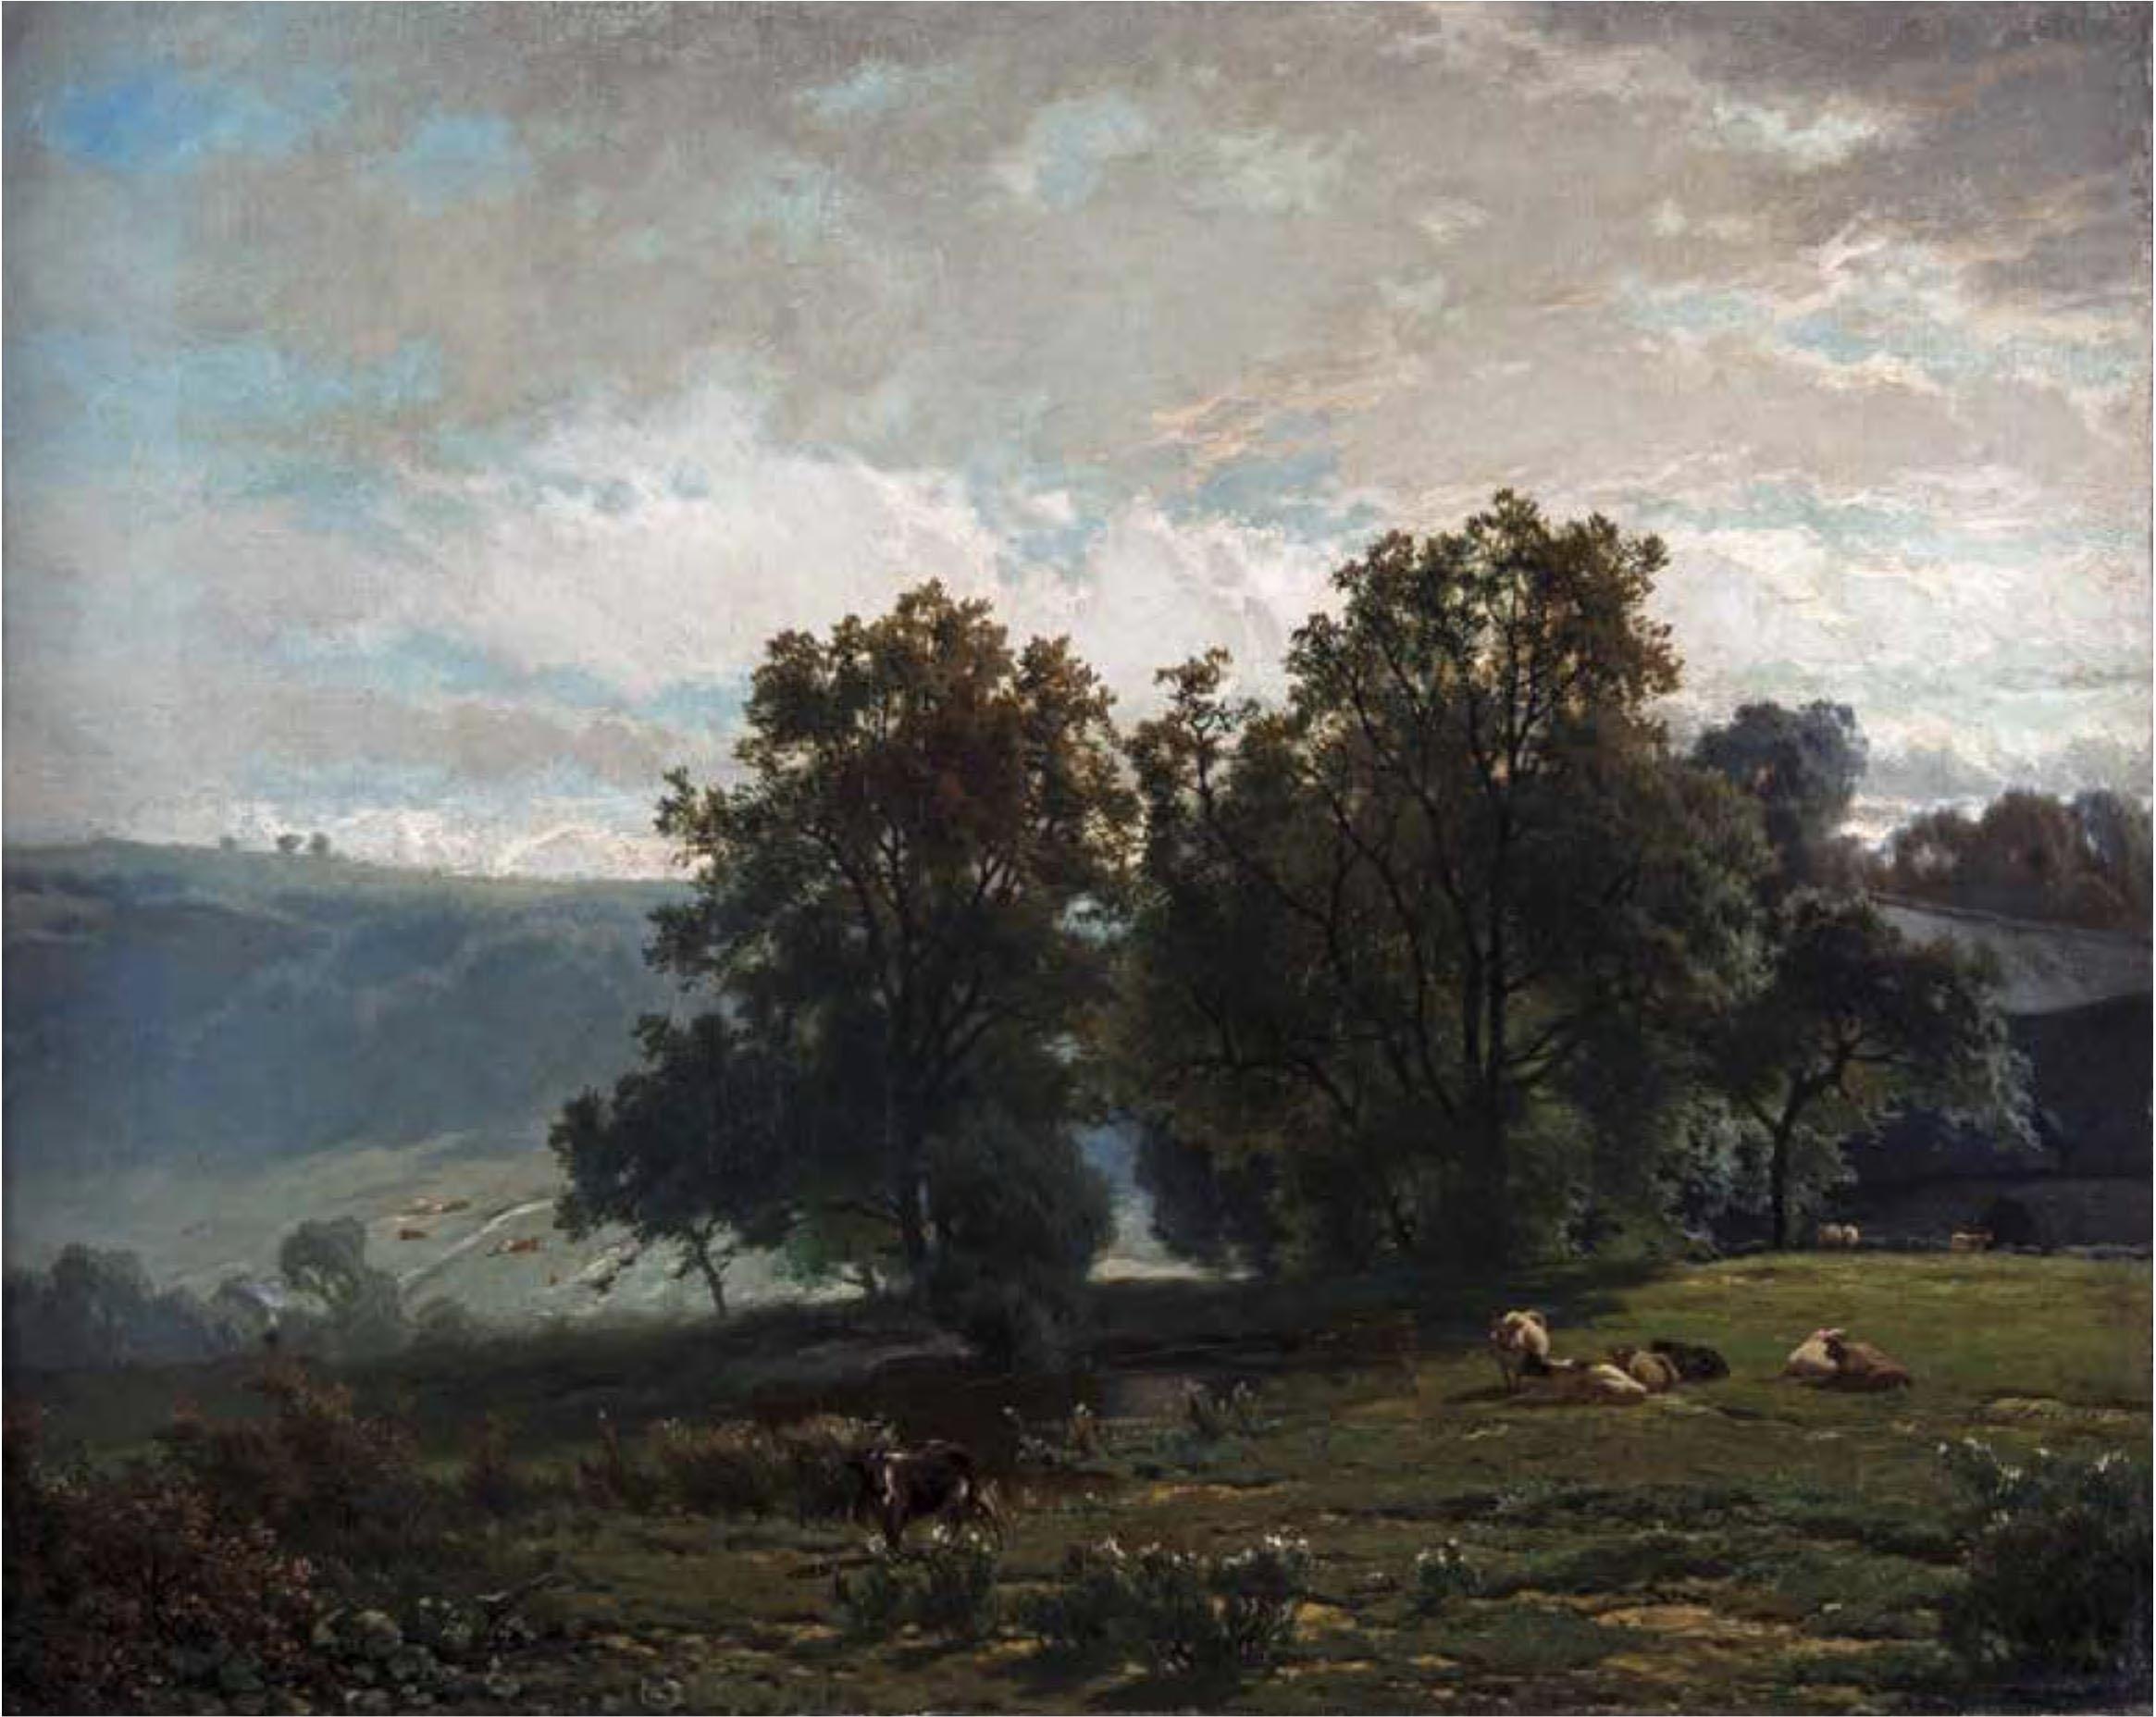 Théodore Fourmois, La Hulpe, 1865, oil on canvas. Hearn Family Trust.